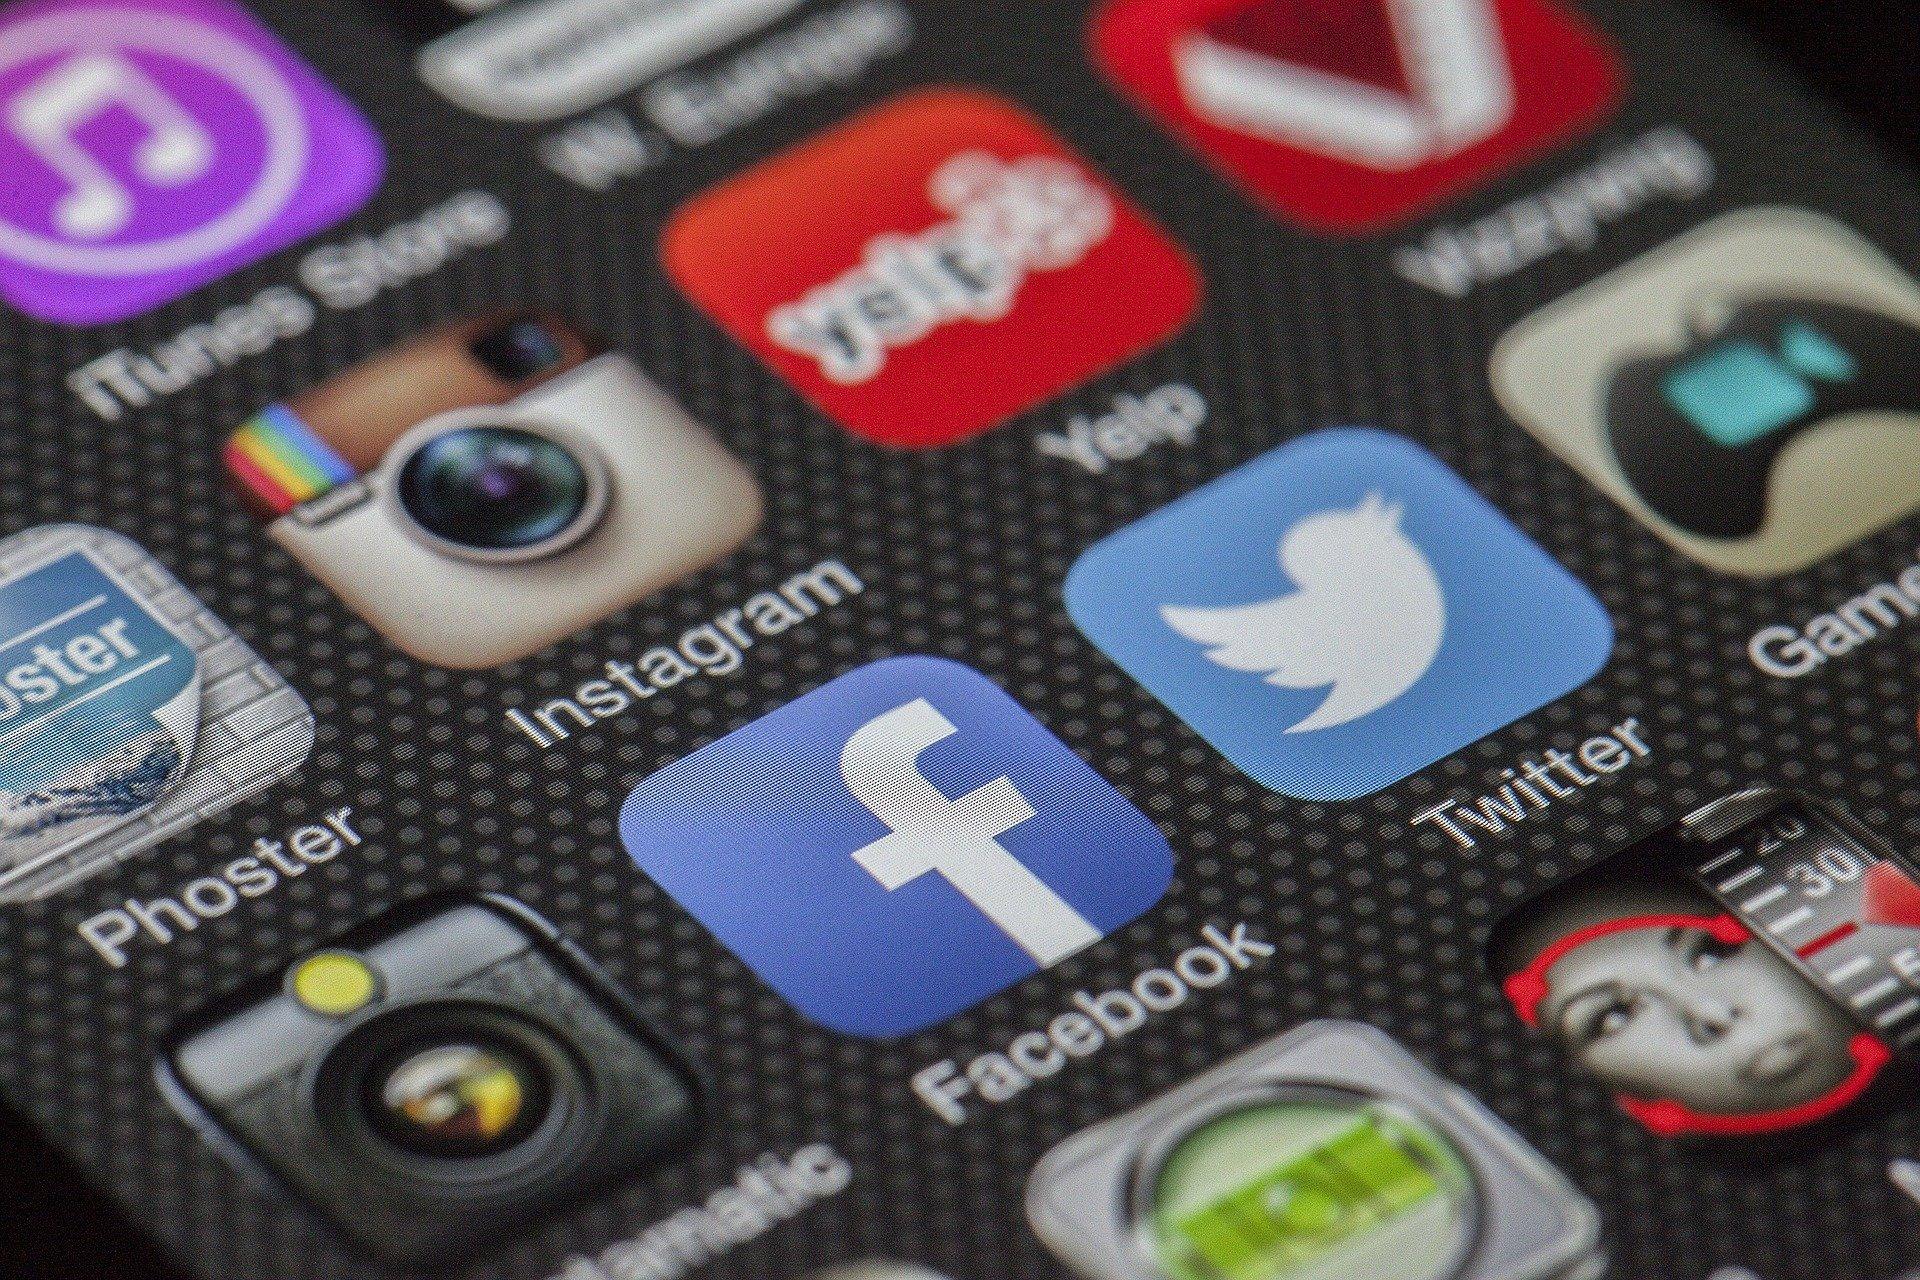 Cyberbullying 'shield' app uses AI to combat social media trolls